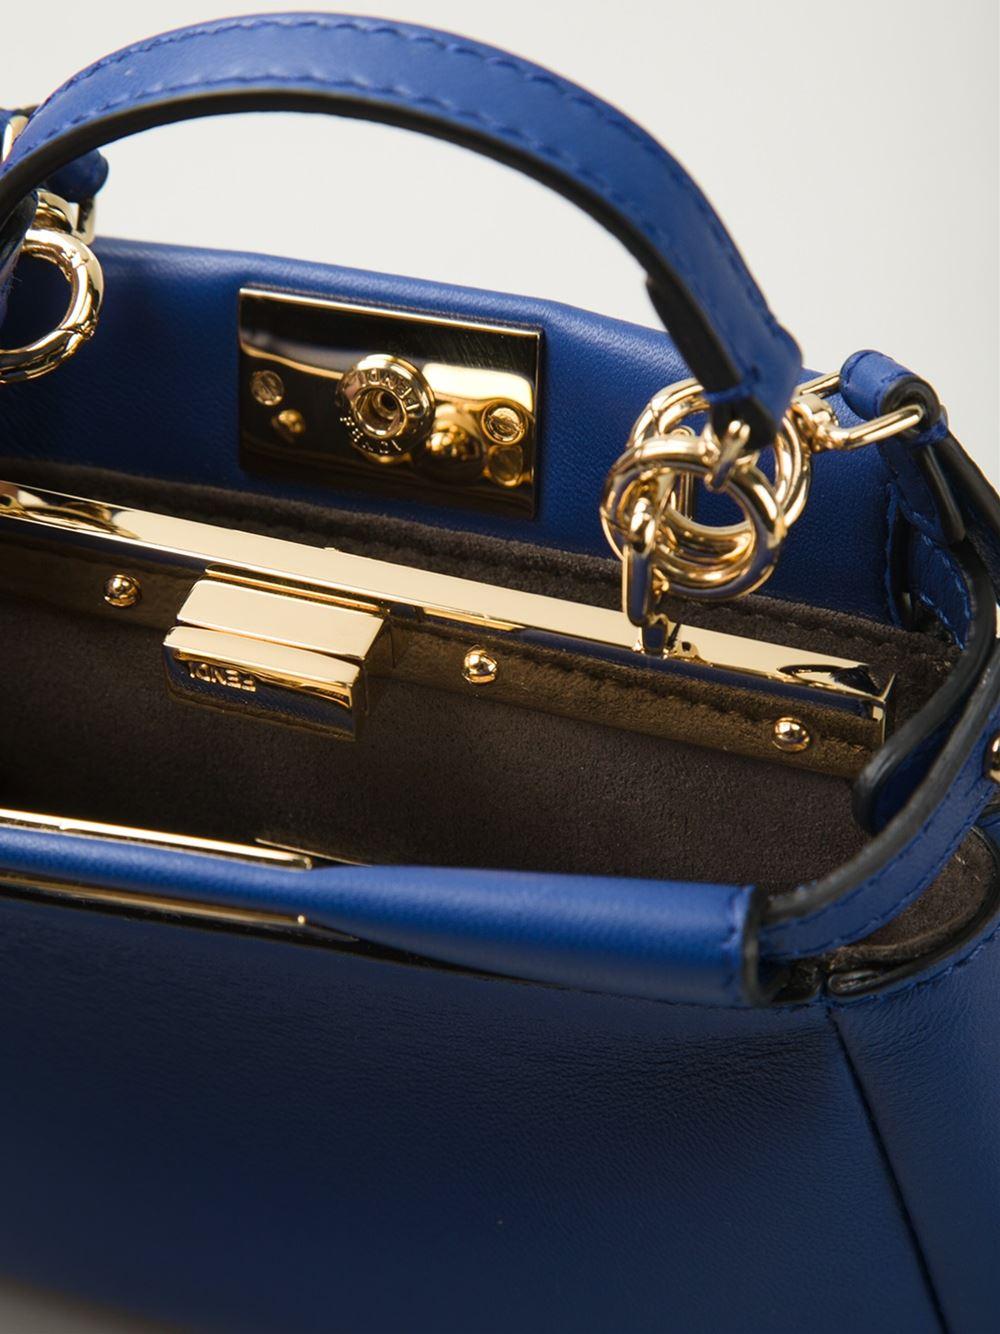 Fendi Peekaboo Navy Blue